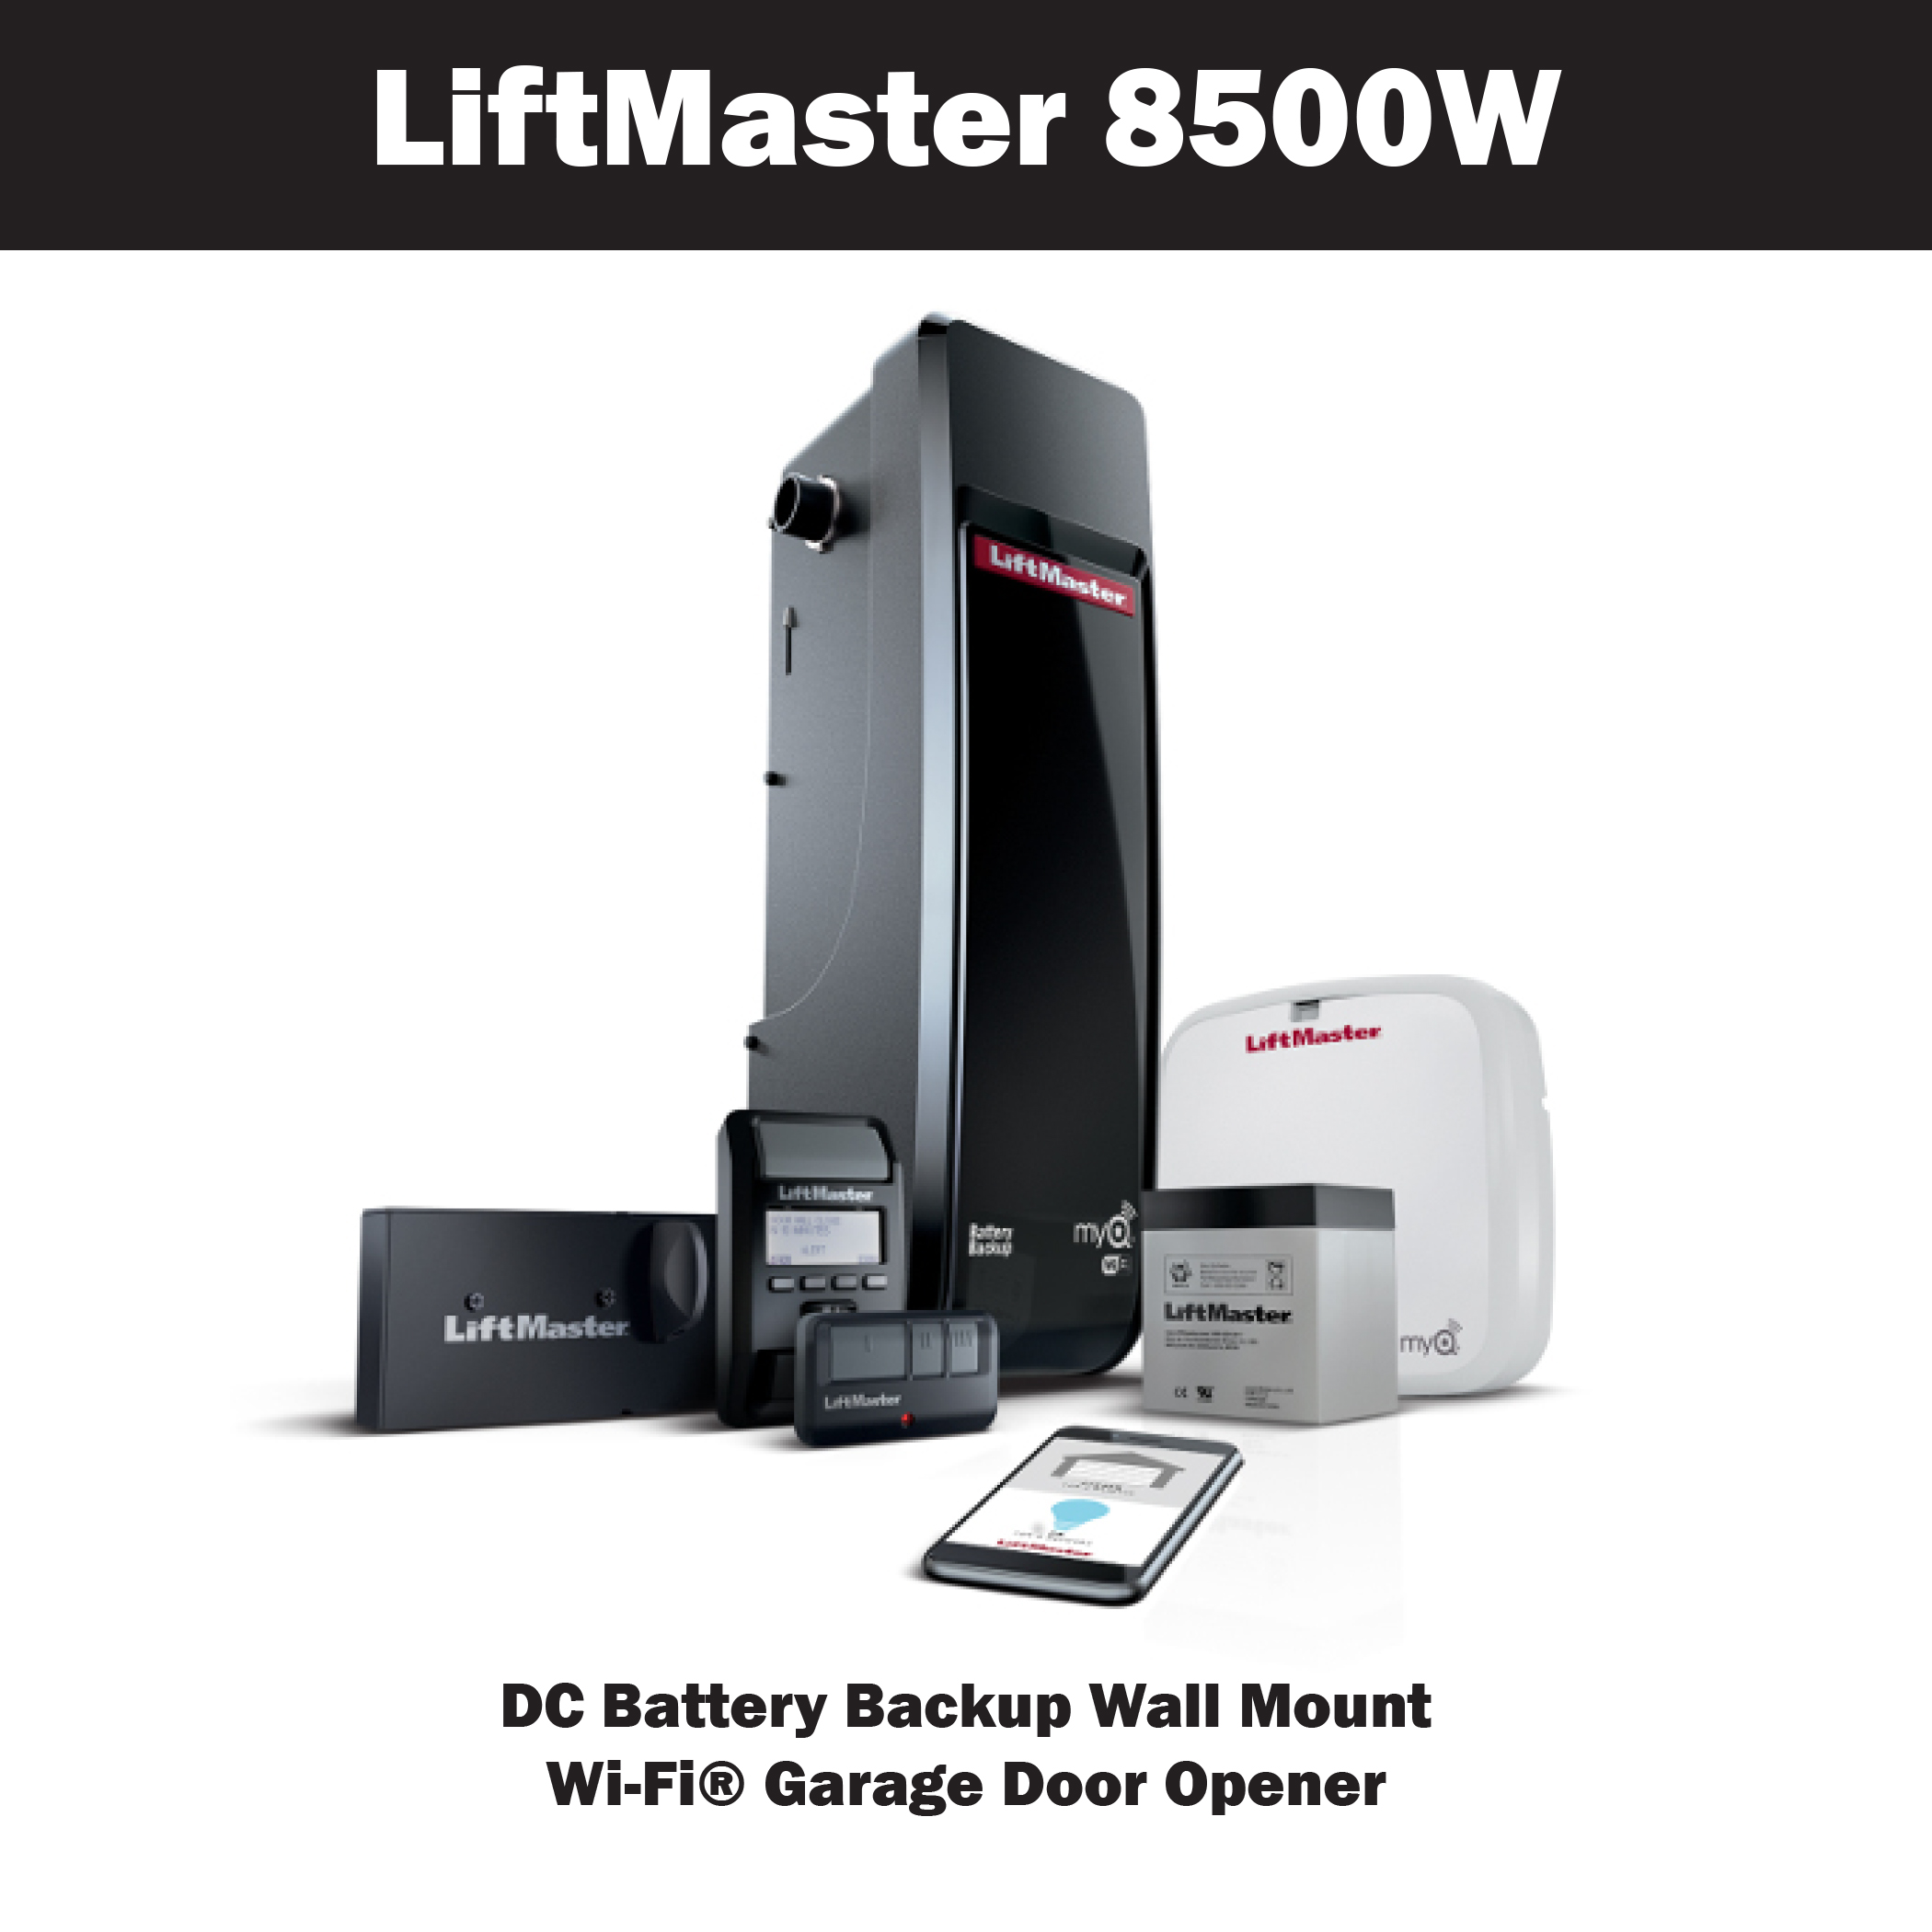 LiftMaster 8500W.jpg